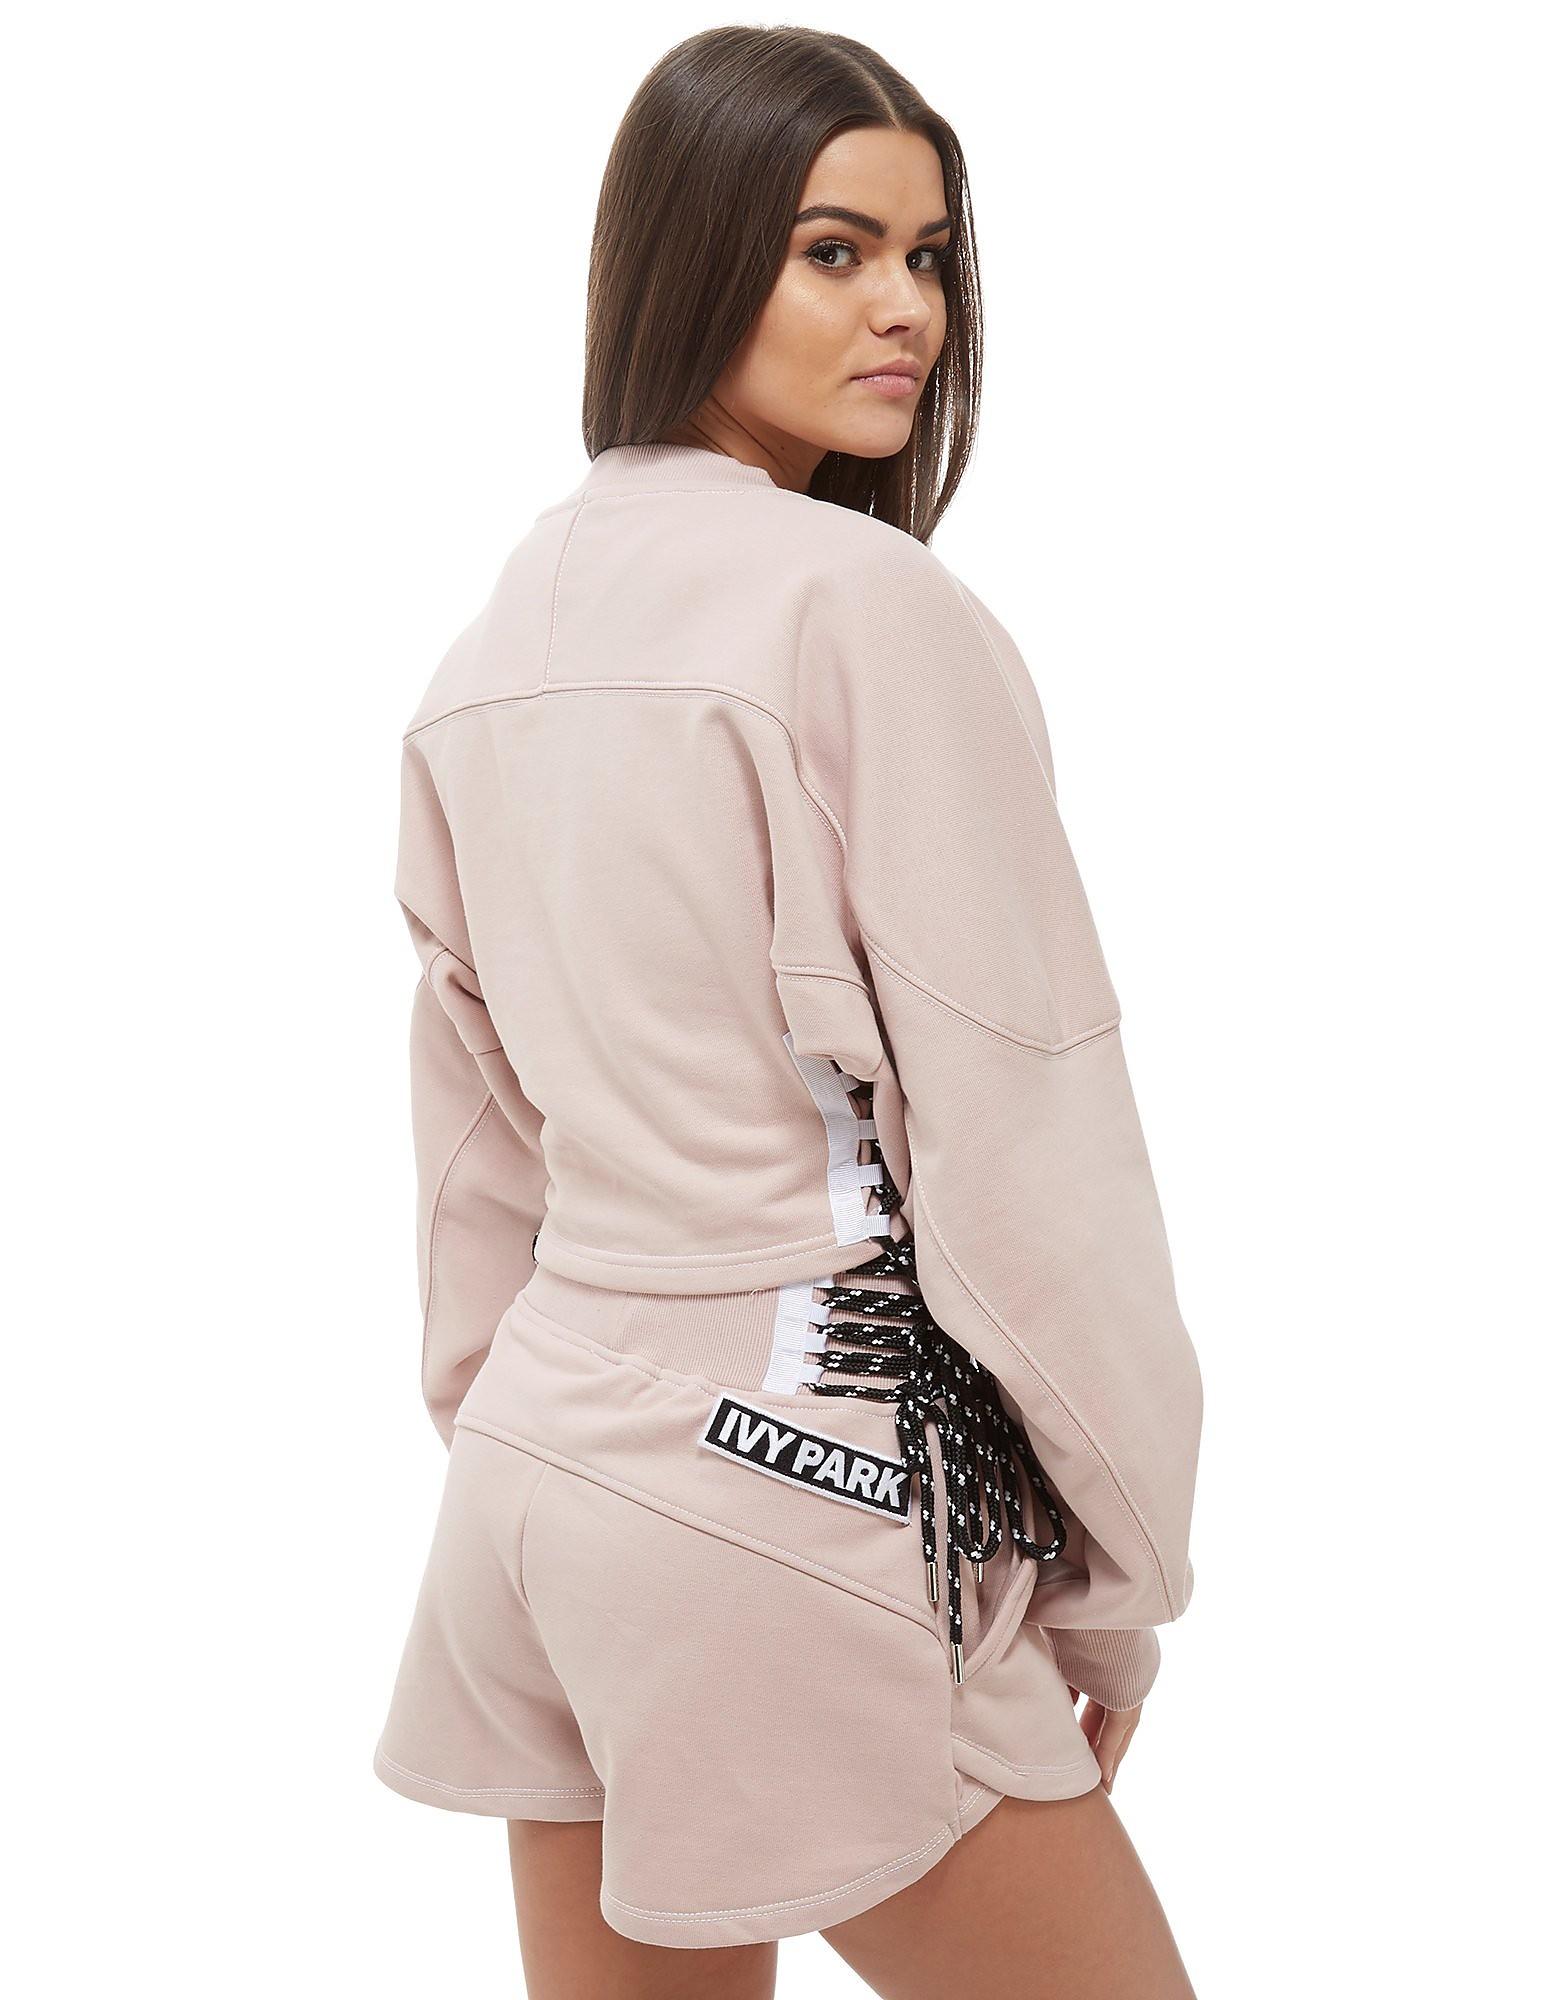 IVY PARK Lace Up Crew Sweatshirt